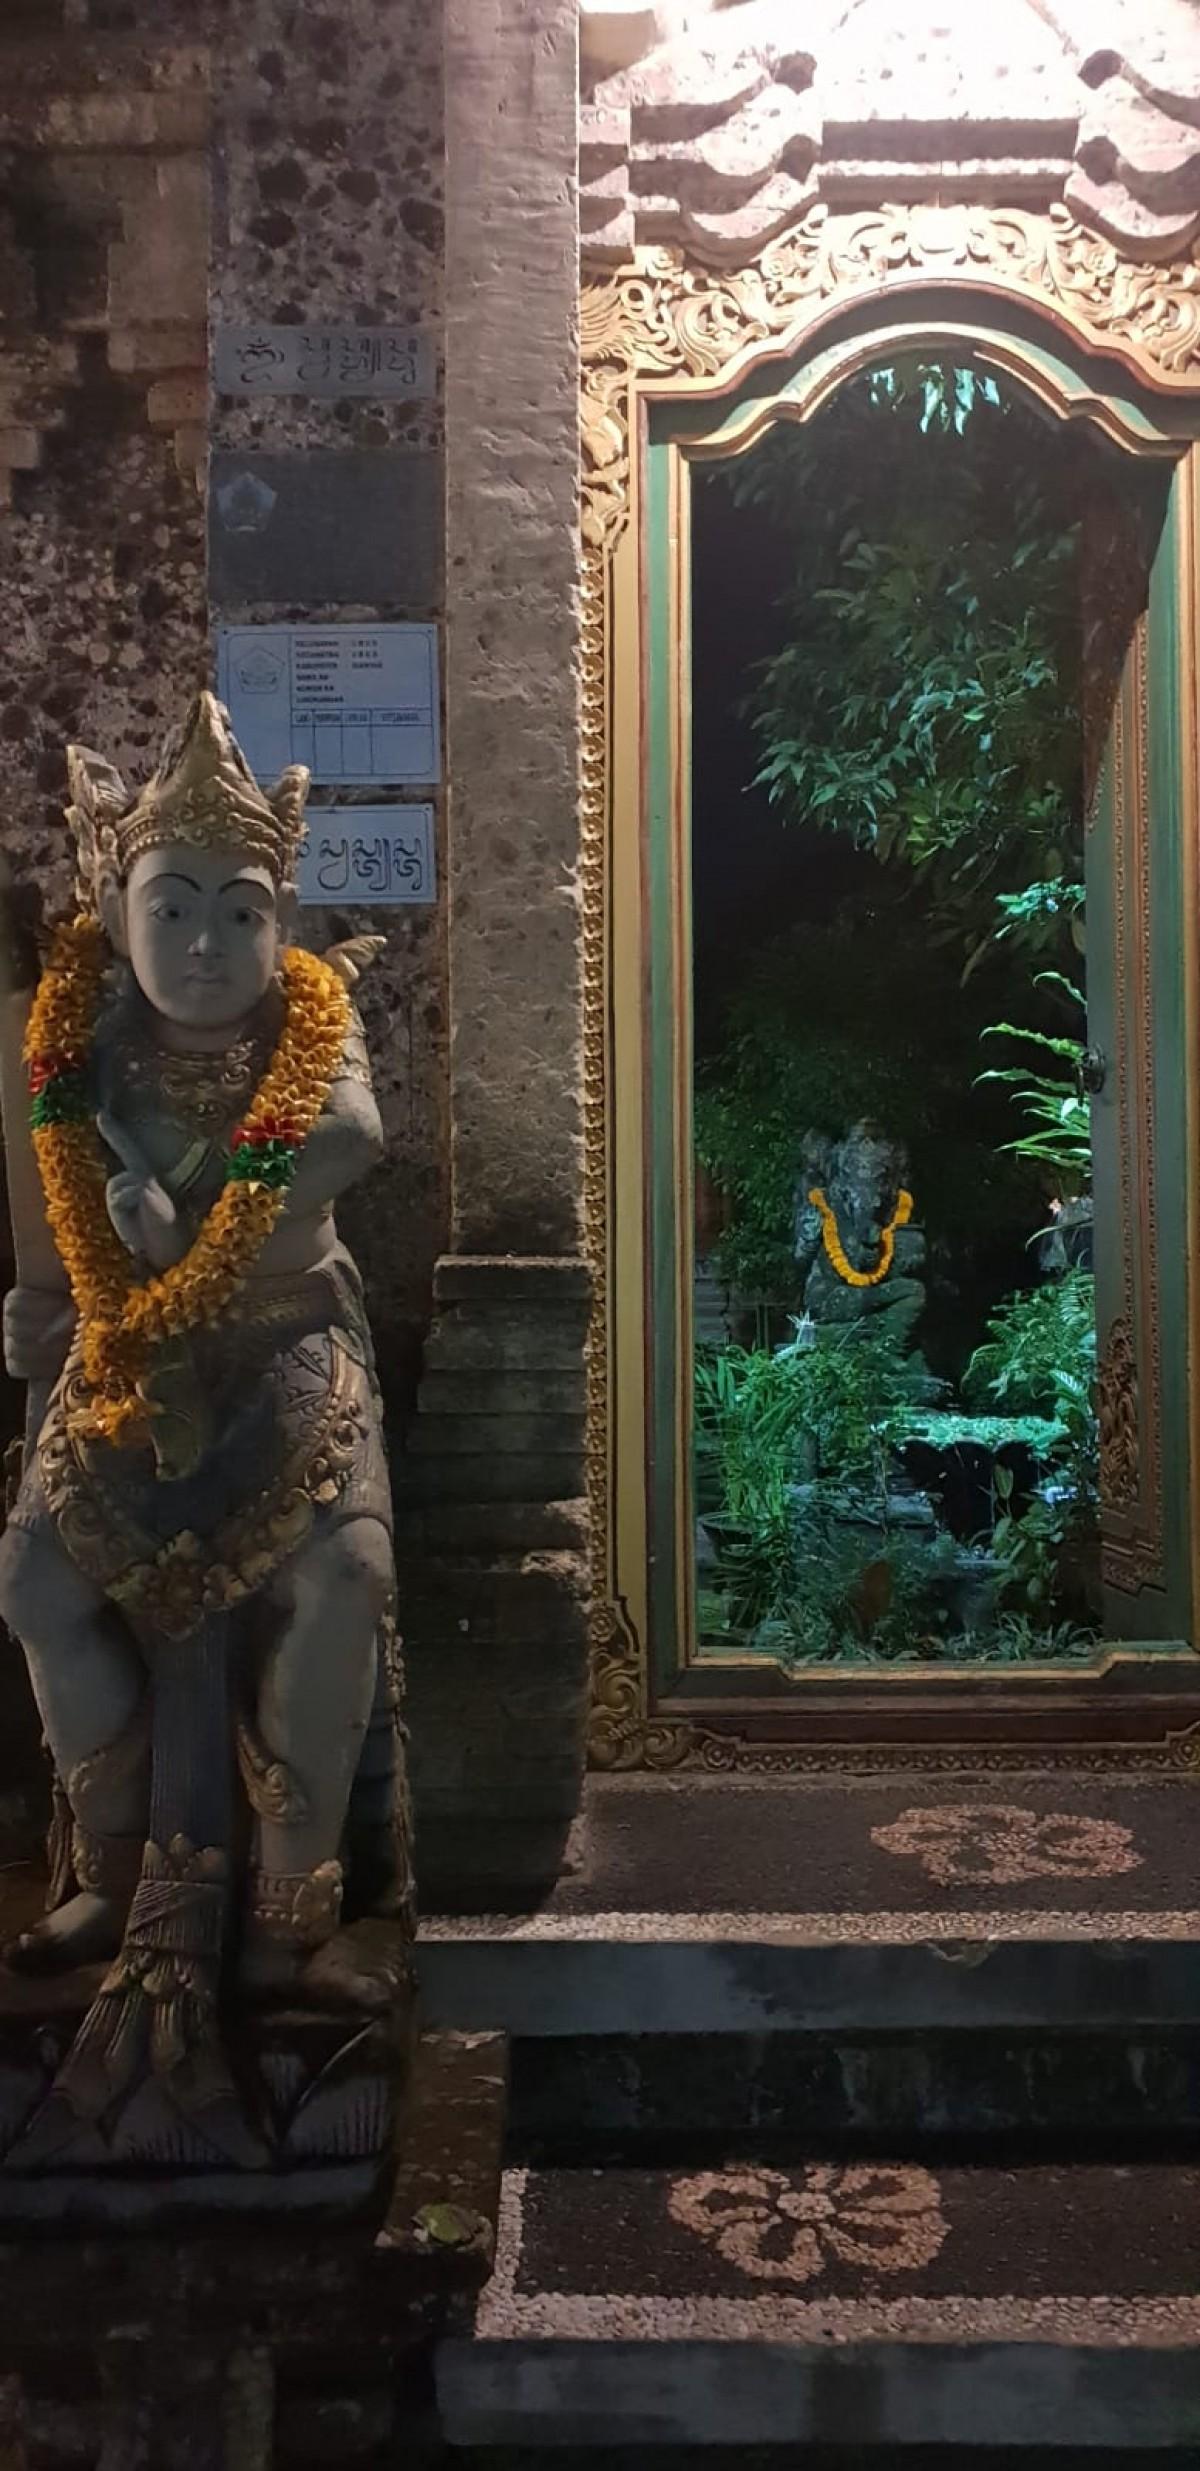 Around the world with Unique Estates - Anastasia Petrova in Bali